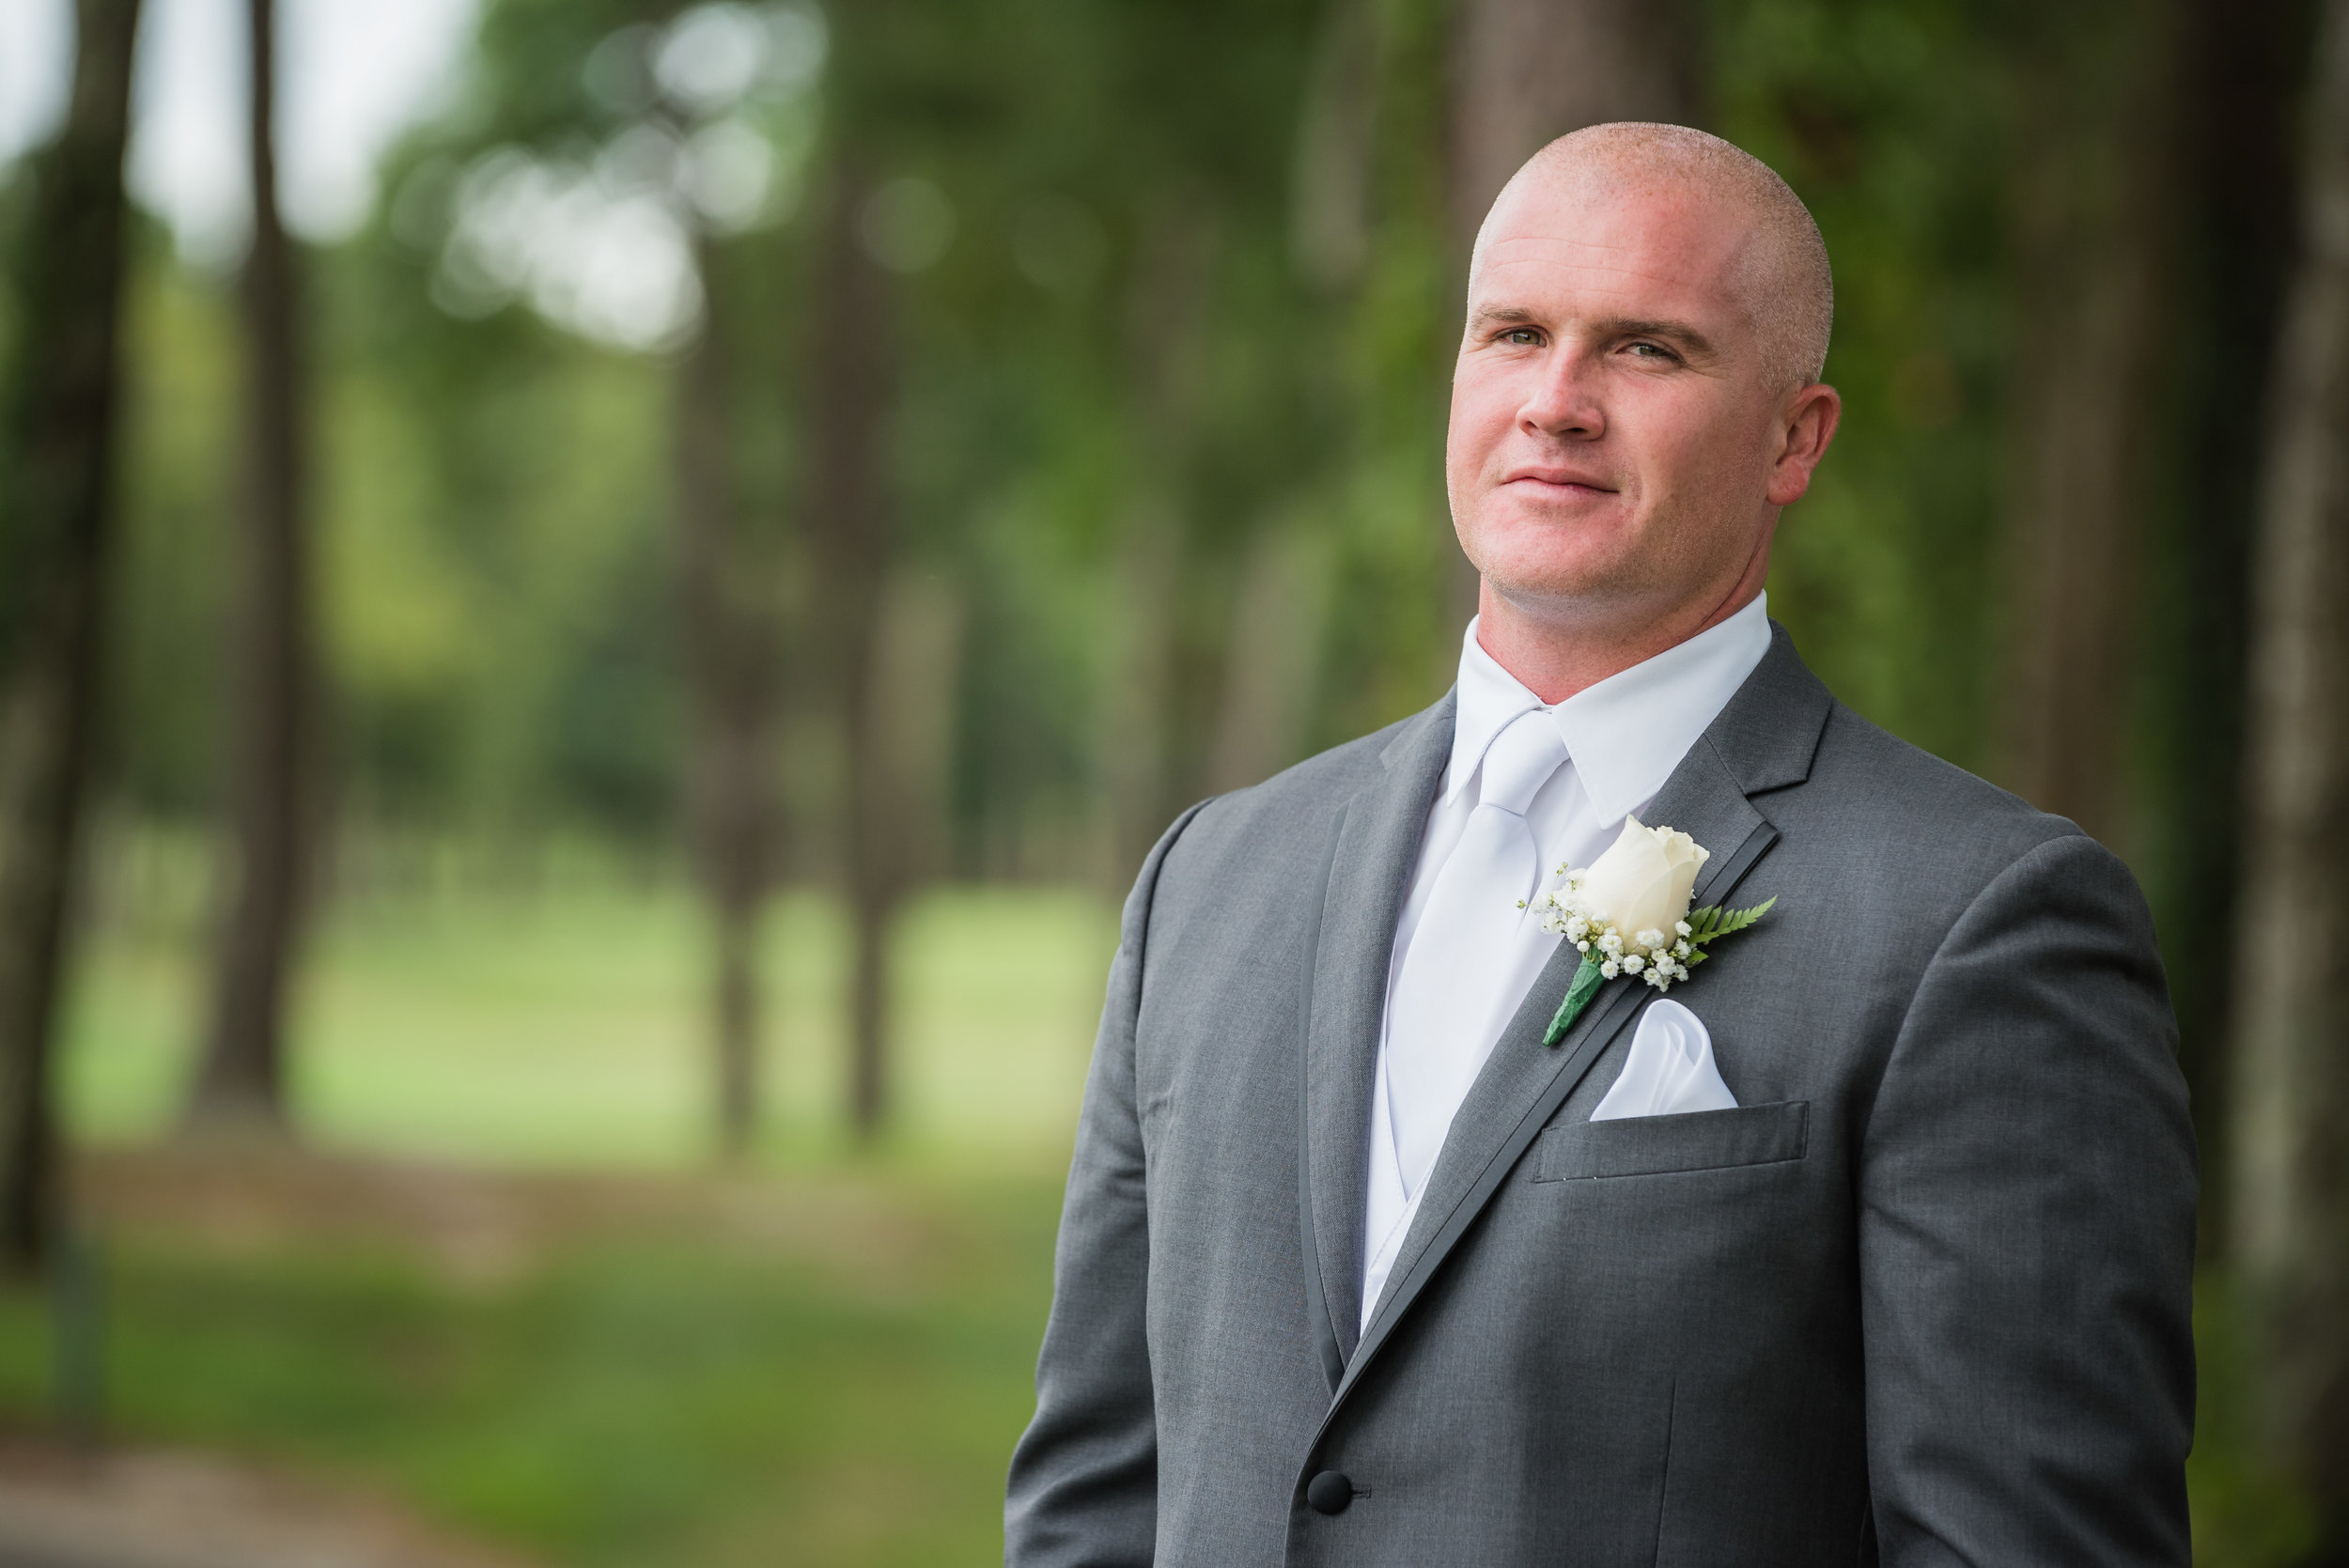 Seaoaks Wedding Photos Steph 12